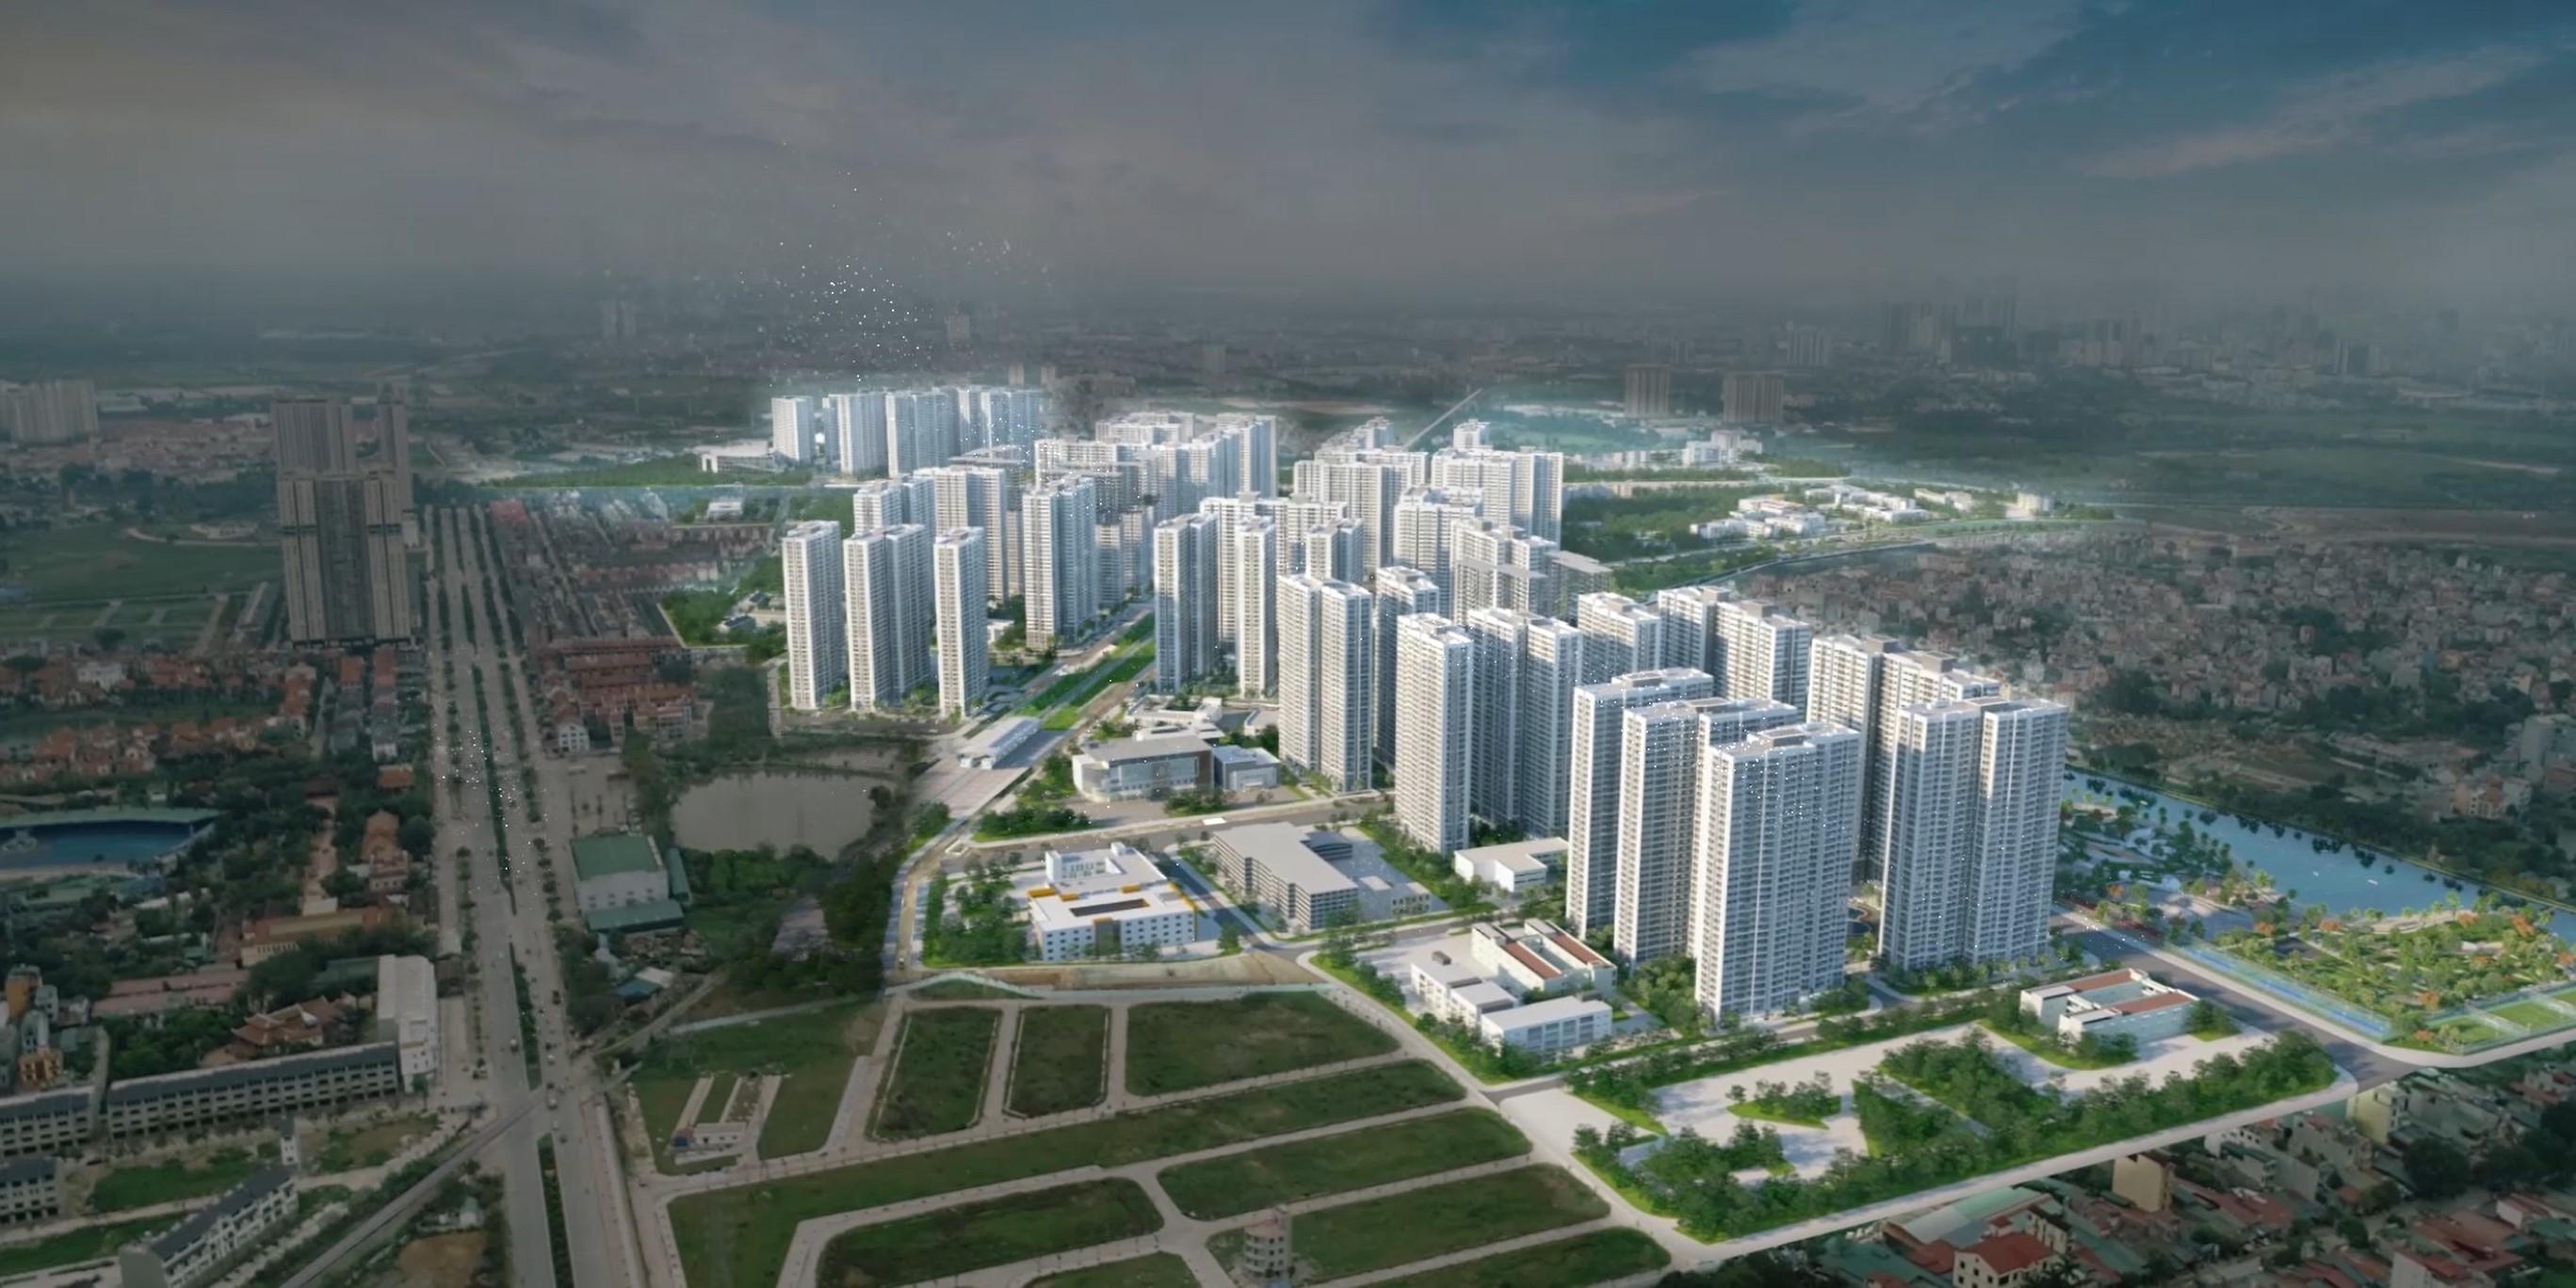 mua-vinhomes-smart-city-chua-bao-gio-don-gian-nhu-vay